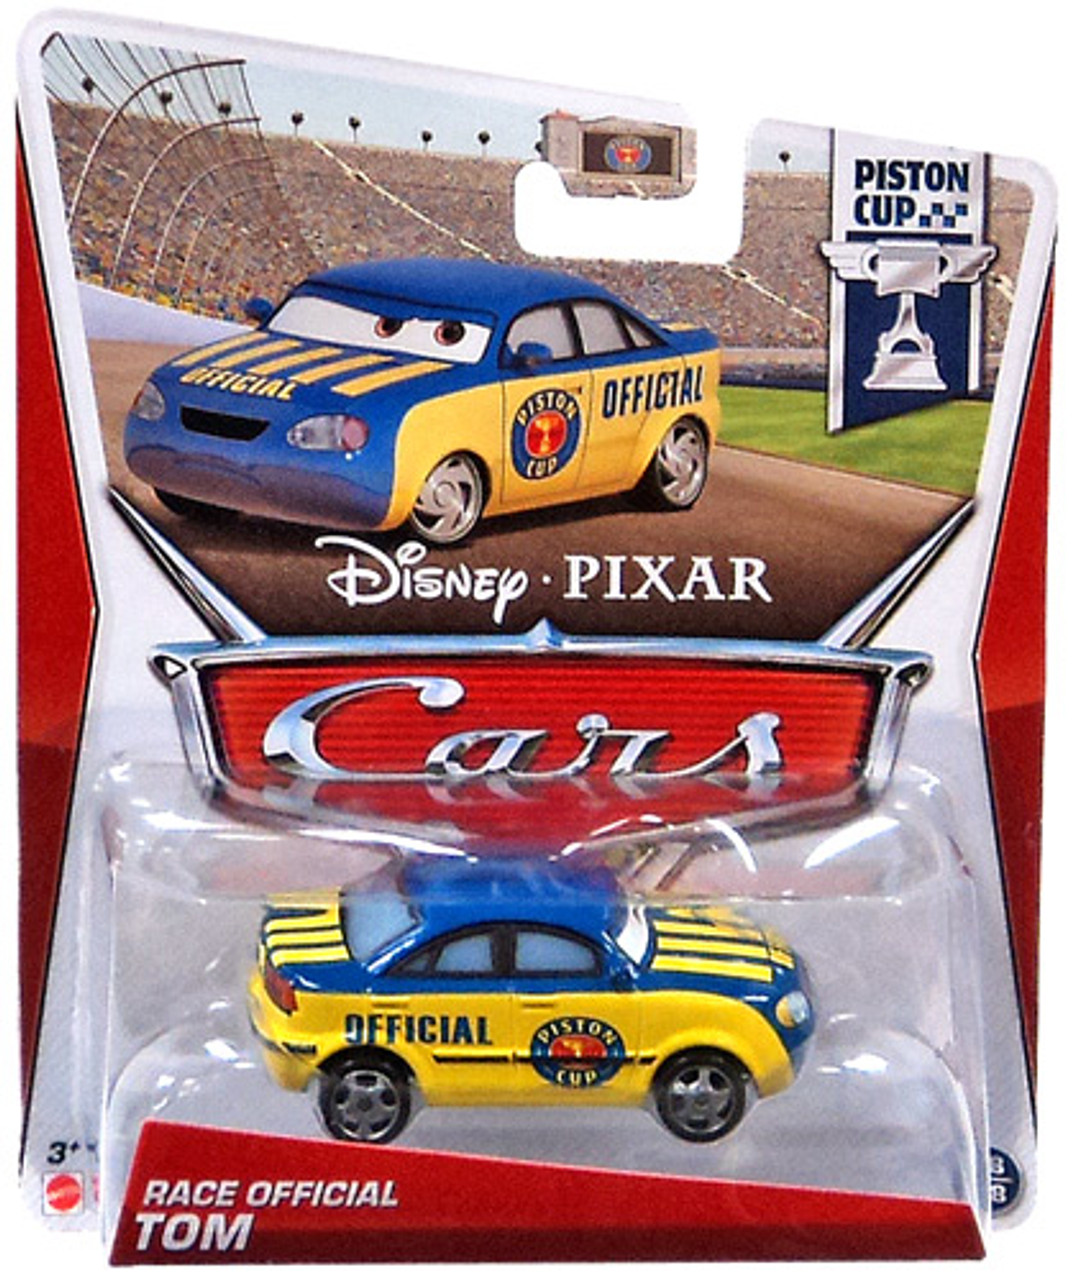 Disney Cars Series 3 Race Official Tom Diecast Car